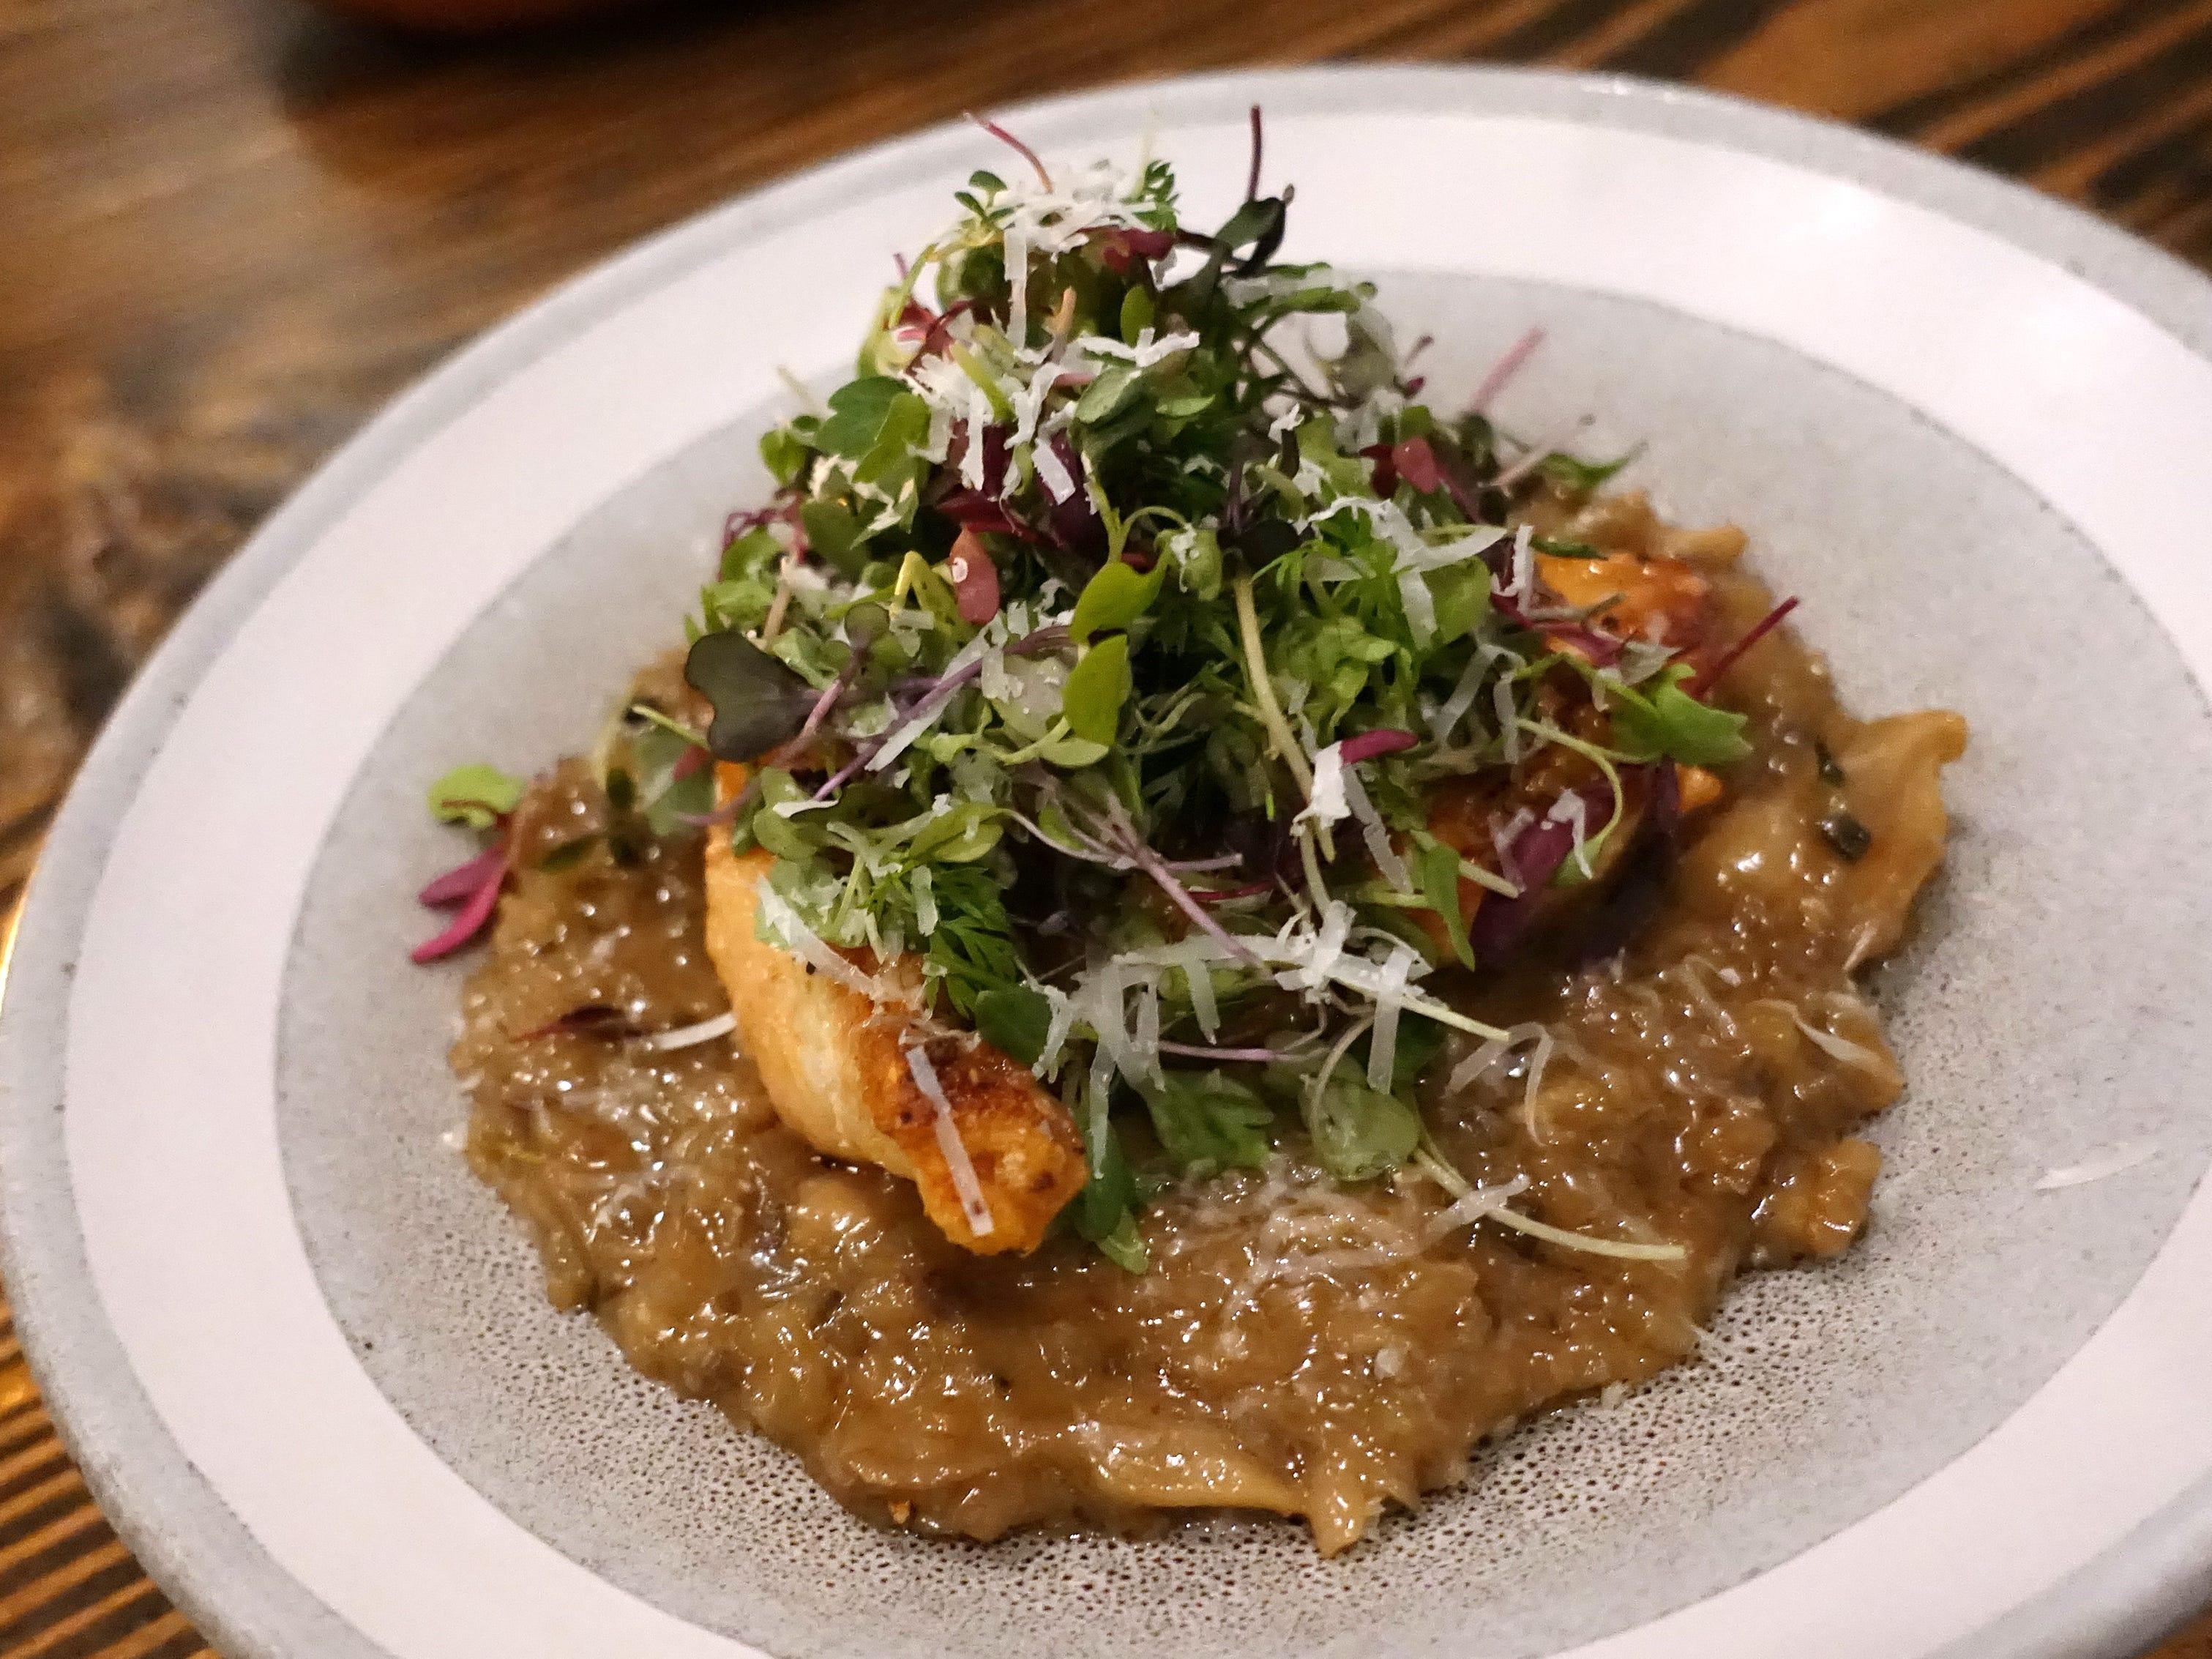 Seared chicken breast with risotto of potato, pecorino, mushroom, lemon and micro salad at Hidden Kitchen in Phoenix.